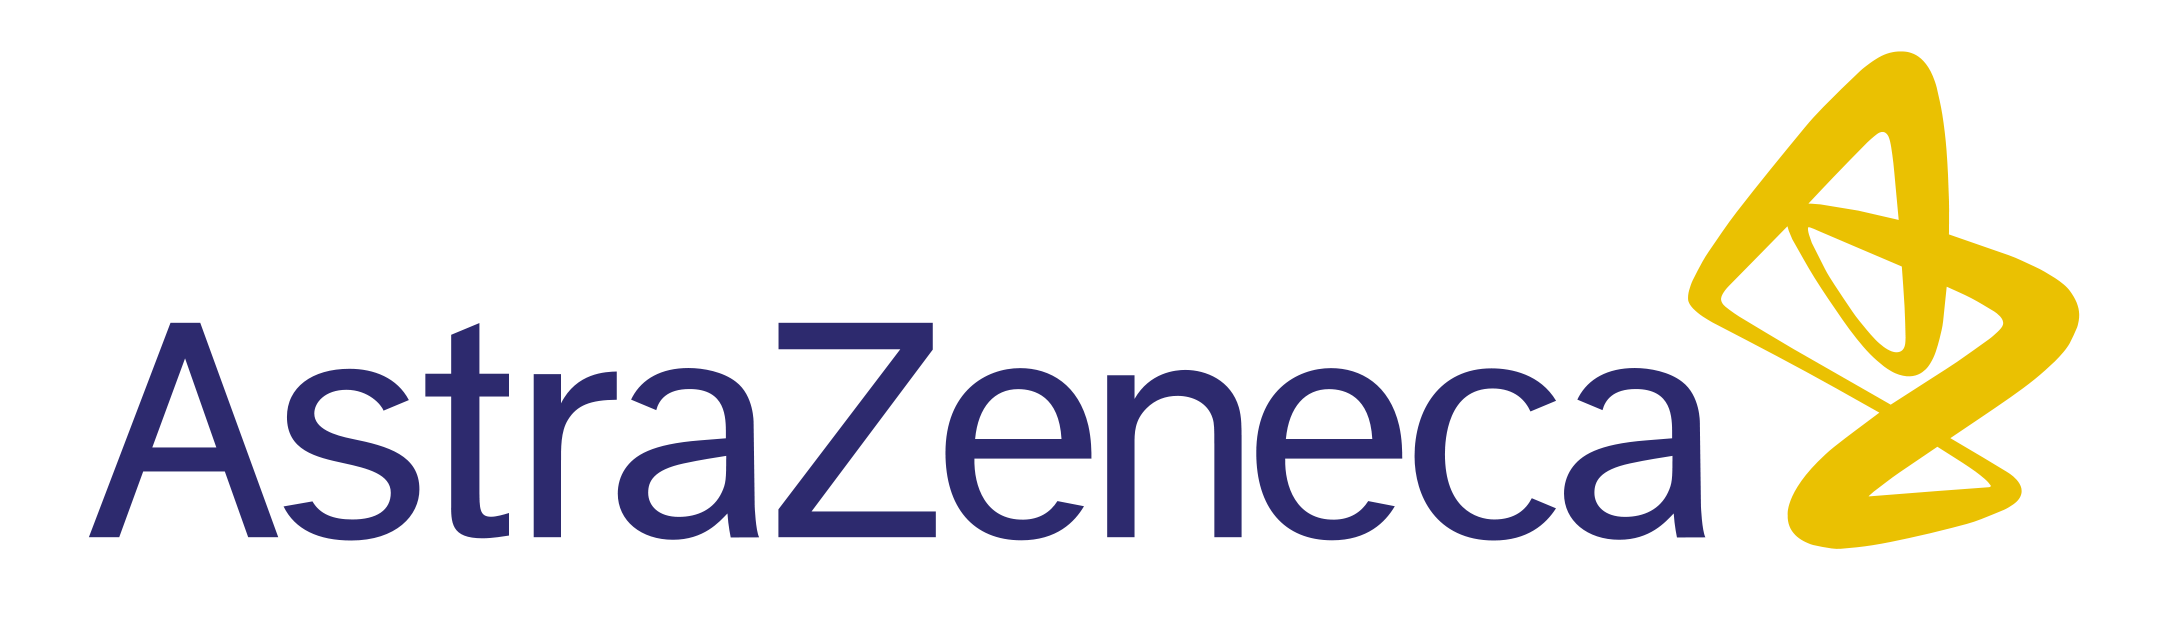 AstraZeneca-logo-and-wordmark.png